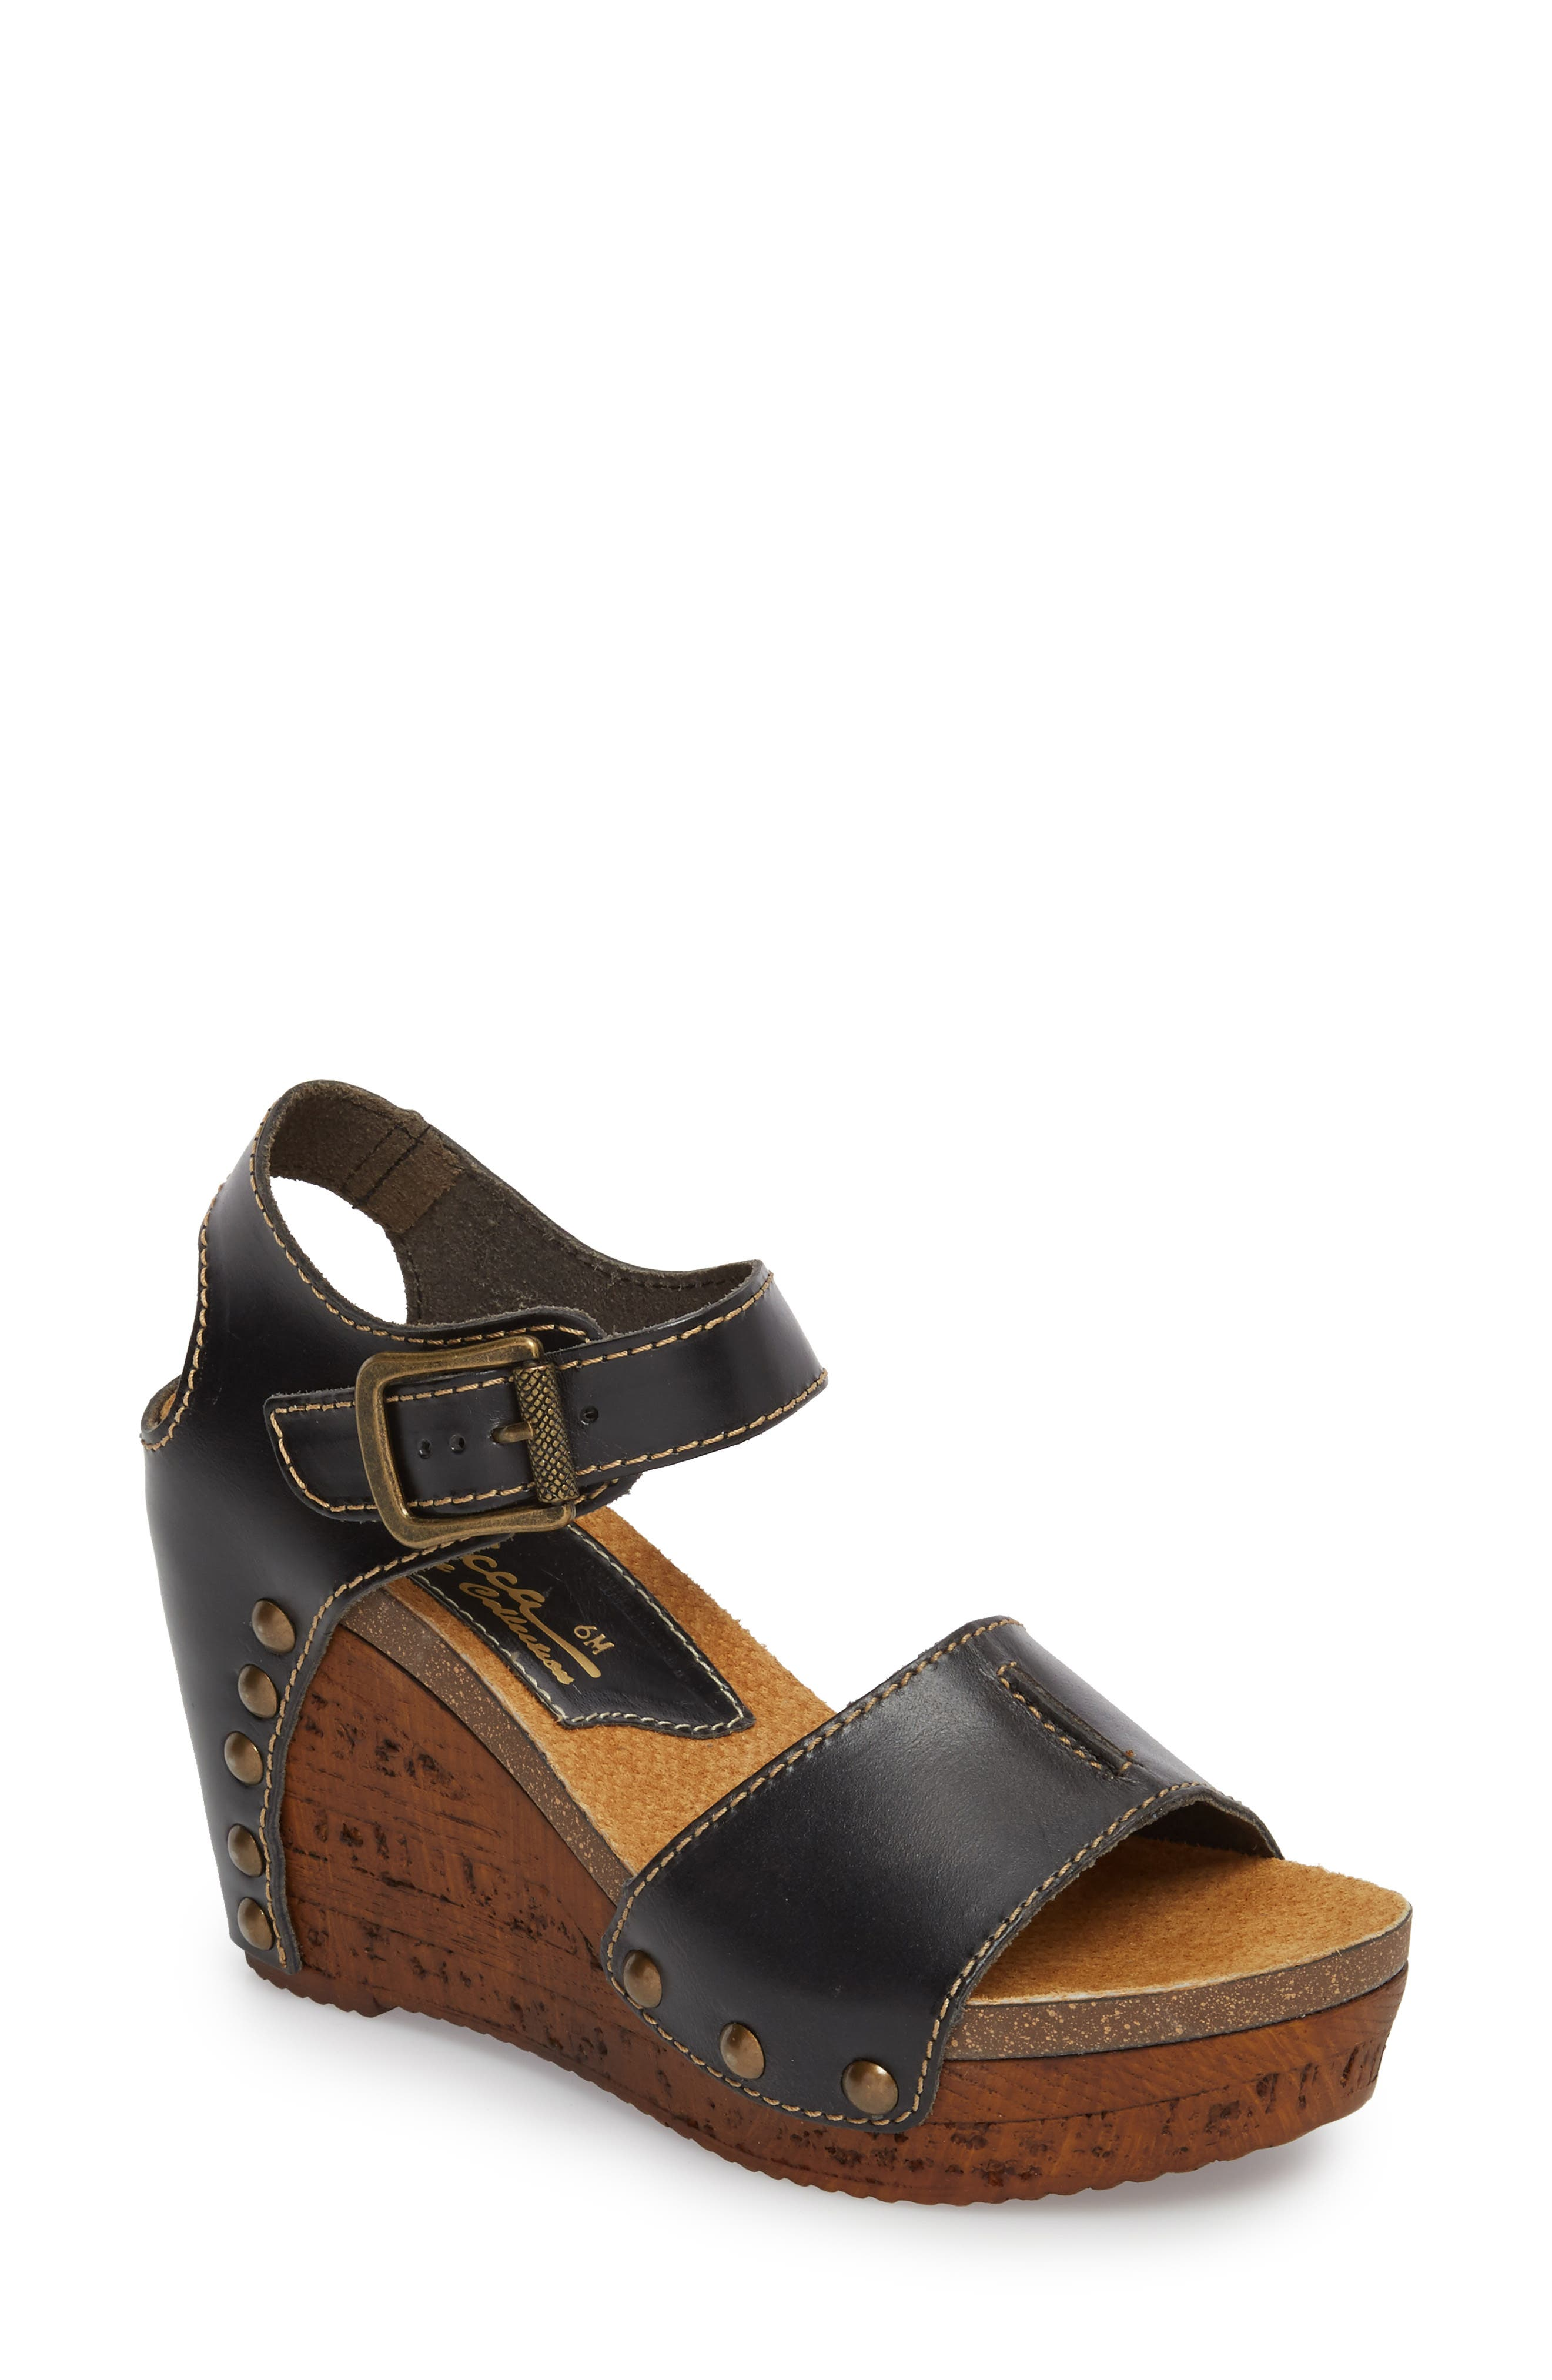 Brella Studded Platform Wedge Sandal,                             Main thumbnail 1, color,                             BLACK